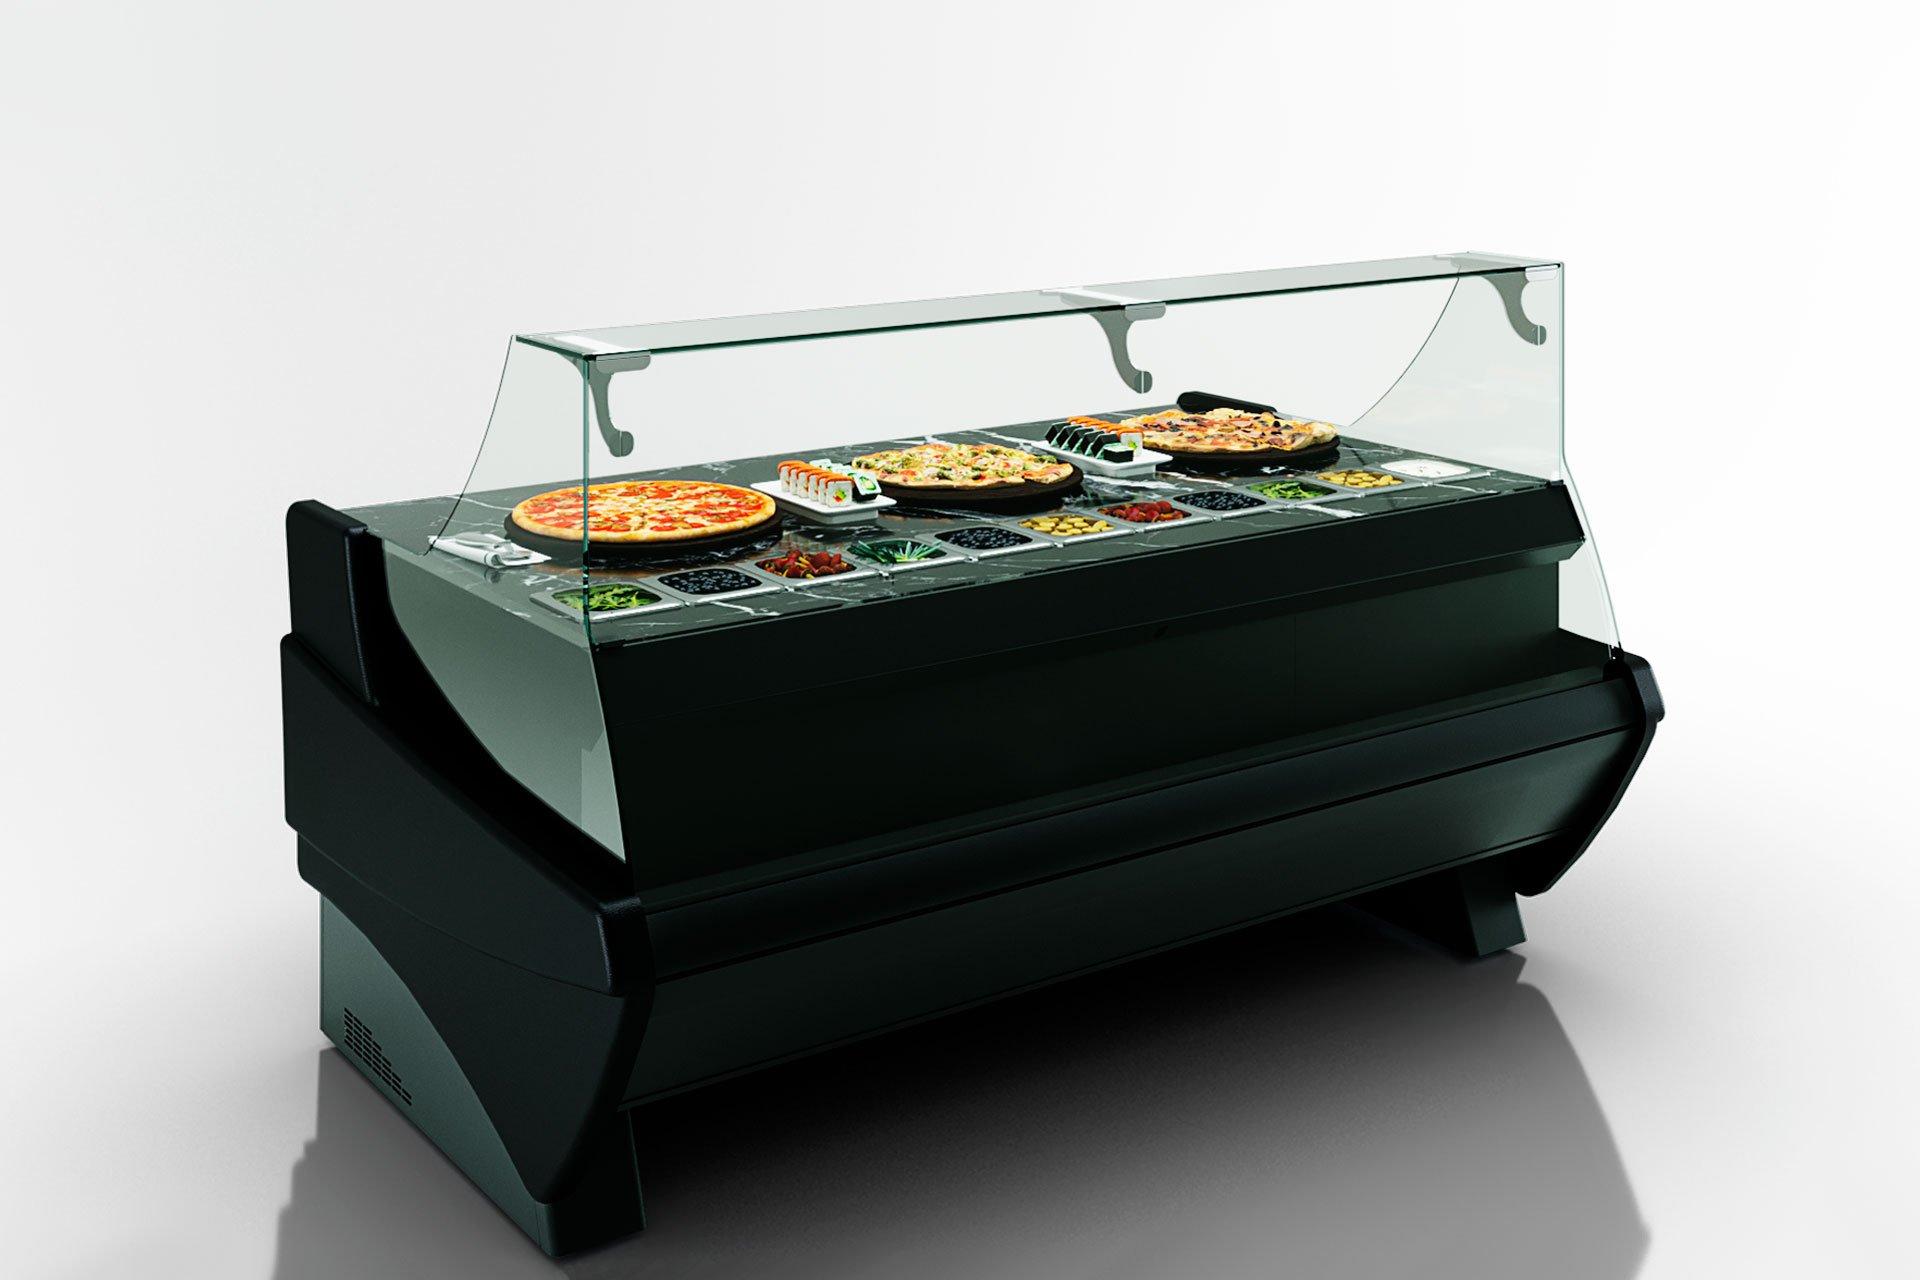 Вітрини Symphony luxe MG 120 sushi/pizza L 125-DBM